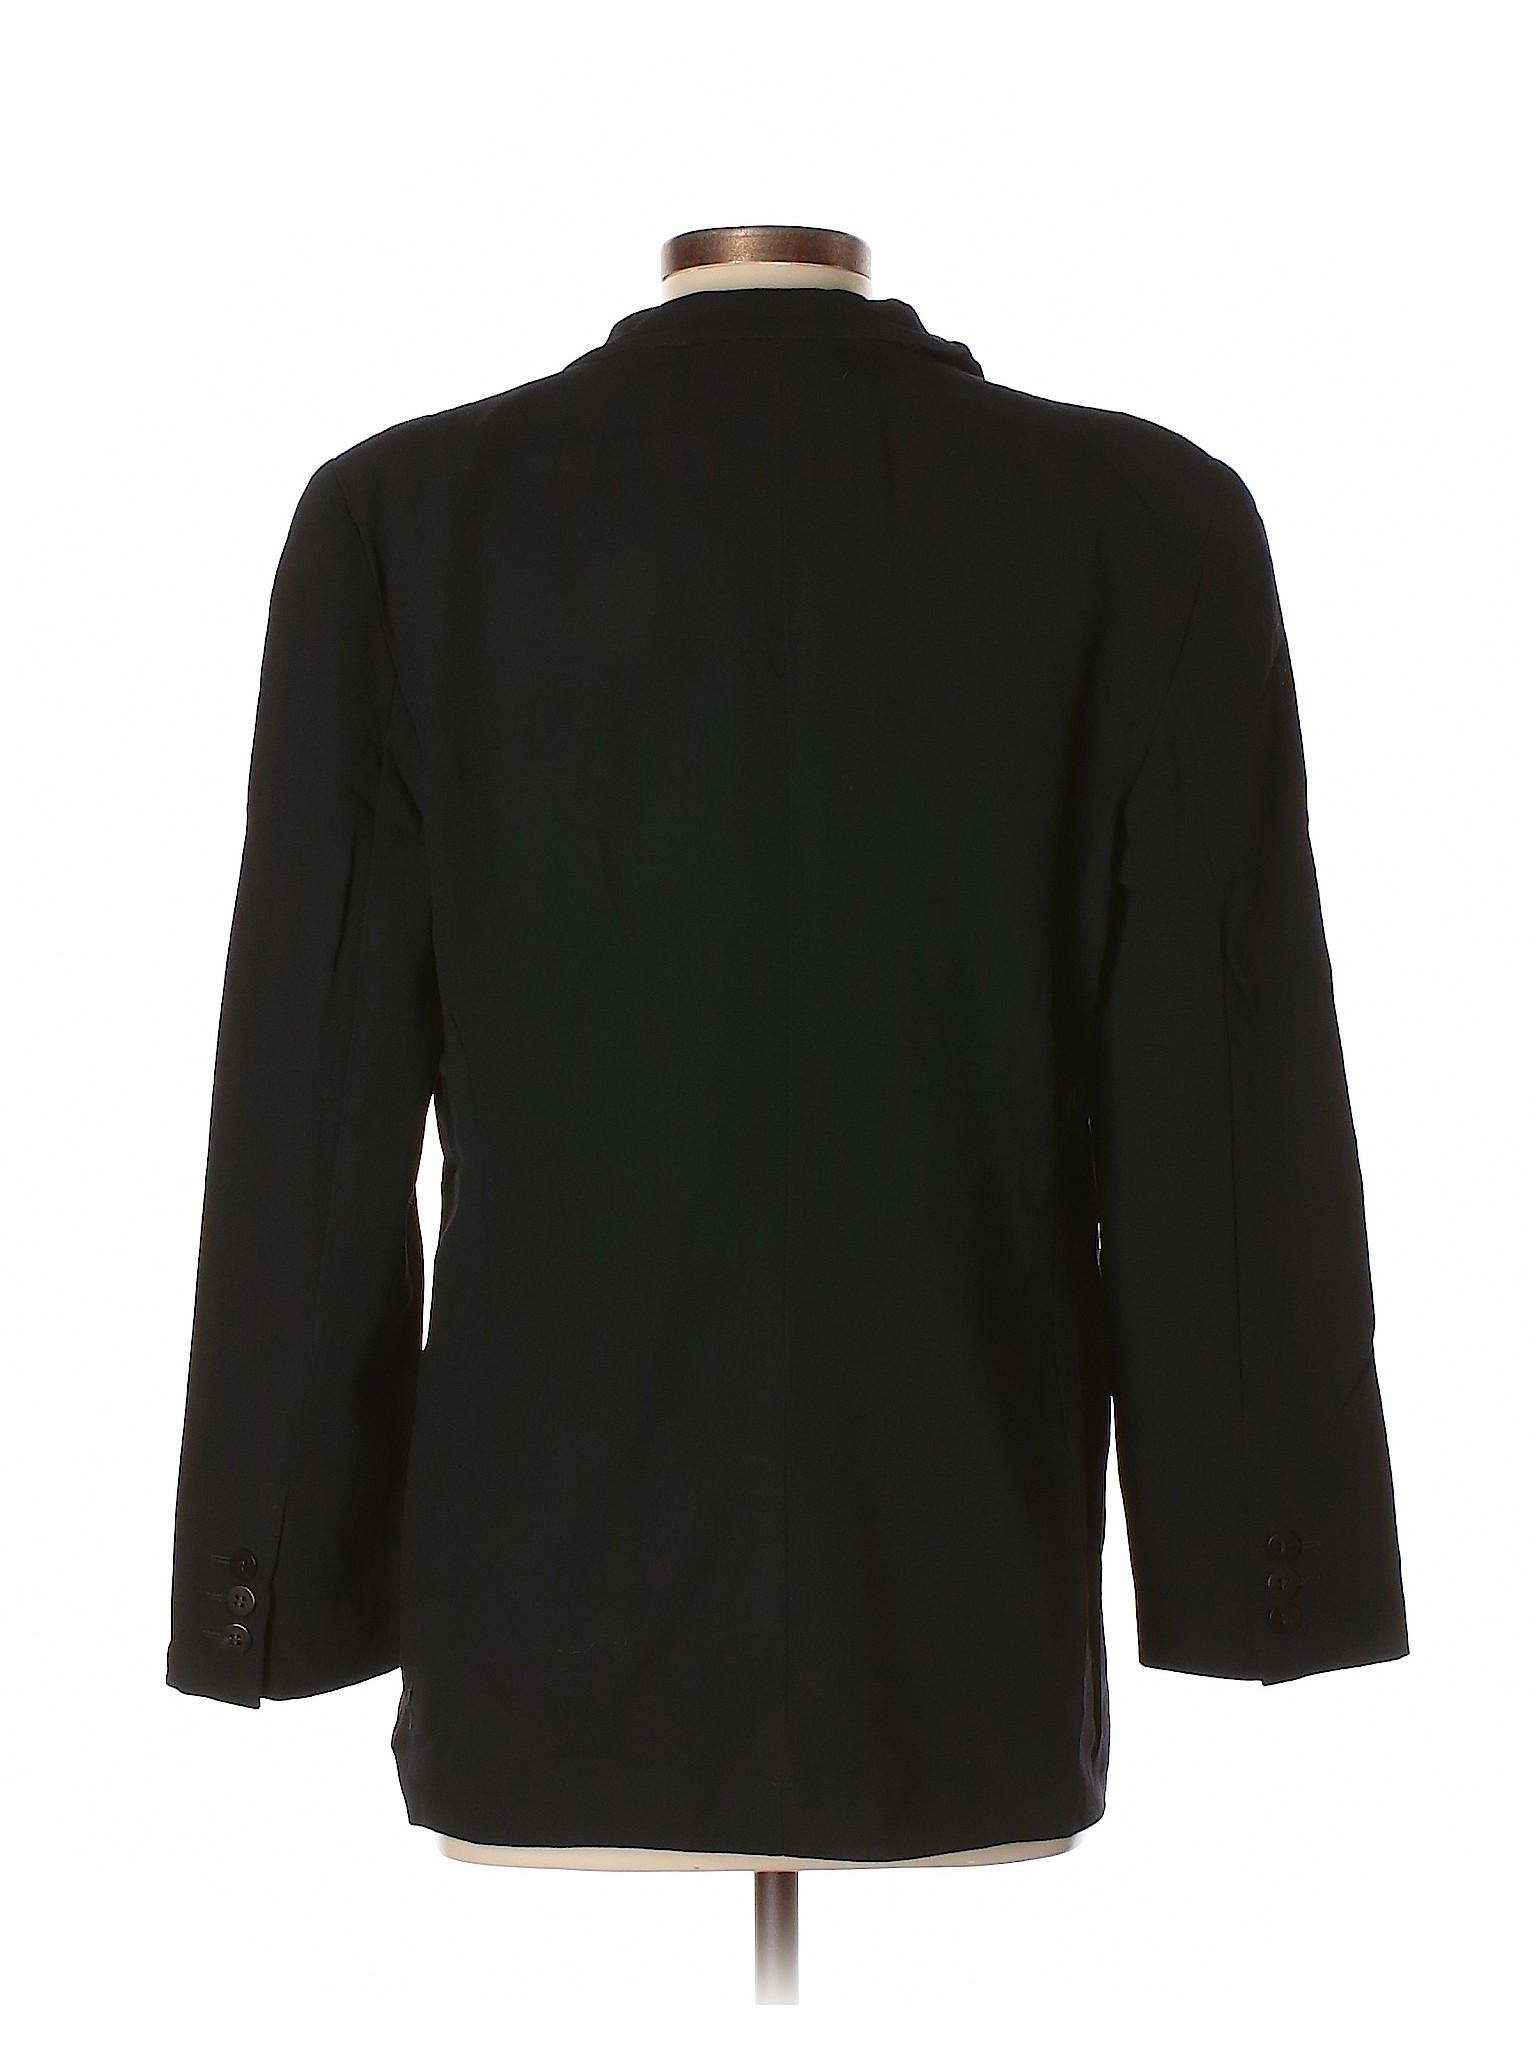 winter Blazer Boutique Giorgio Armani Wool dwaqIxa